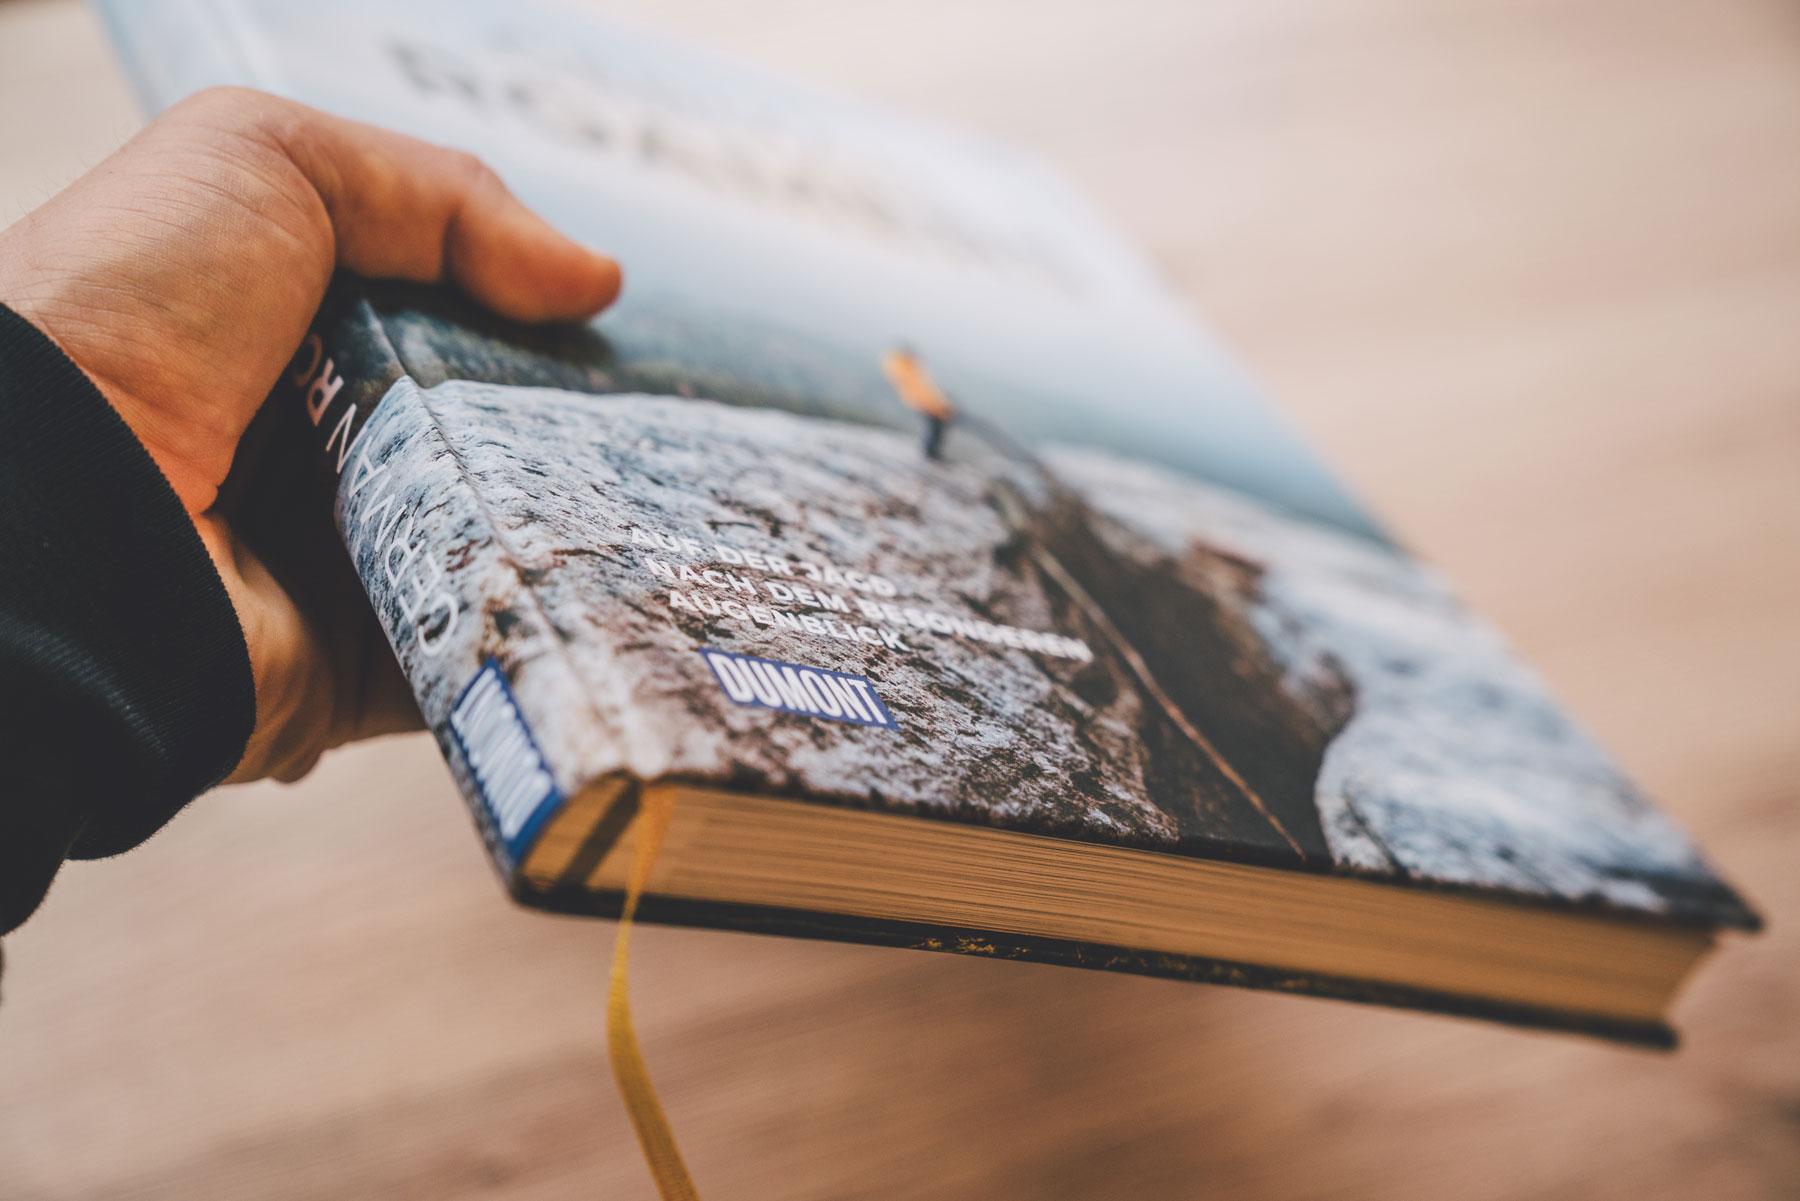 RomanKoenigshofer_Germanroamers_Book_Photographer_Outdoor_DSC04771